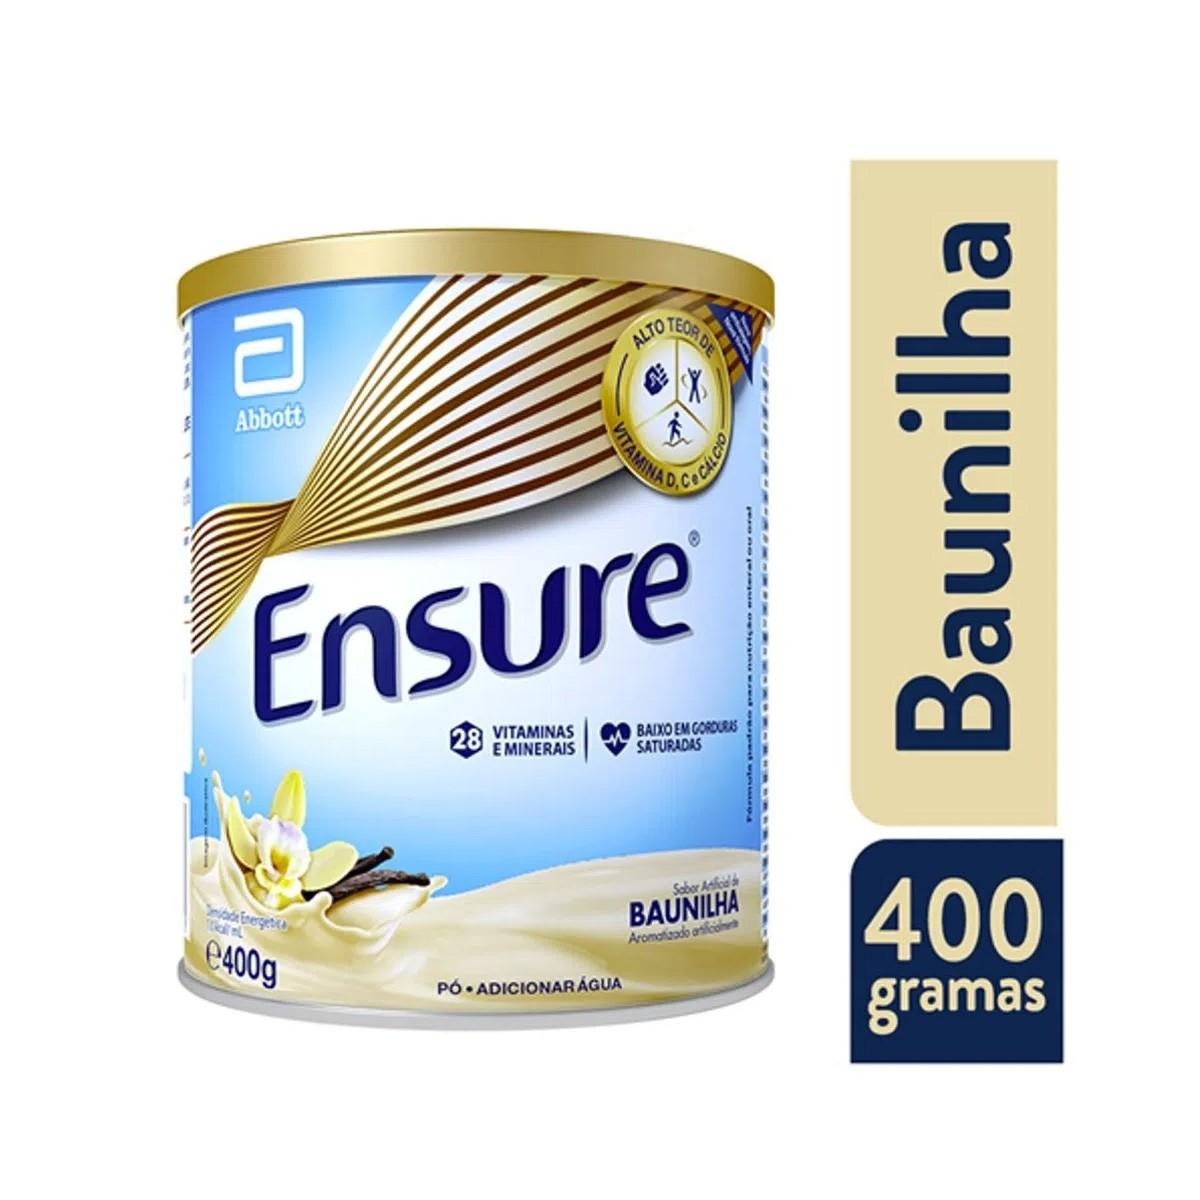 Ensure Baunilha 400g - Suplemento Alimentar